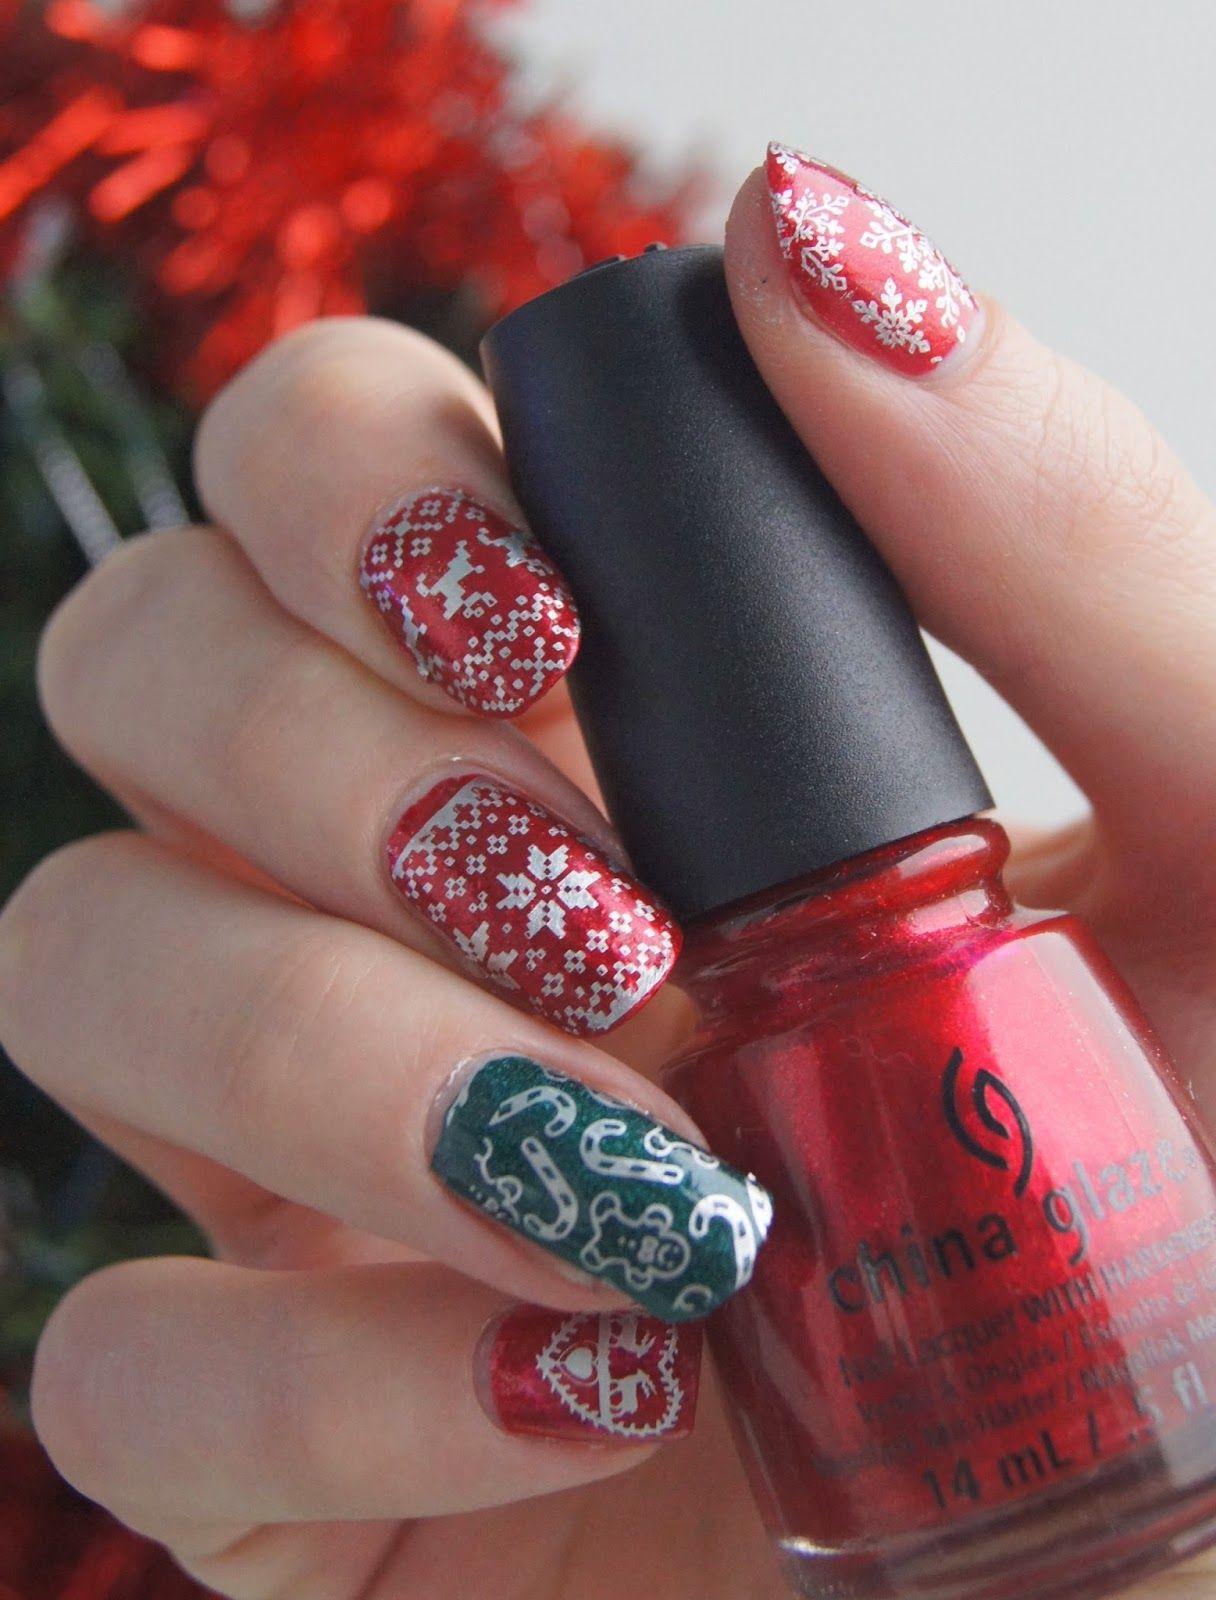 #christmas #nailart #nails #noël #green #rouge #stamping @neejolie @topatopa